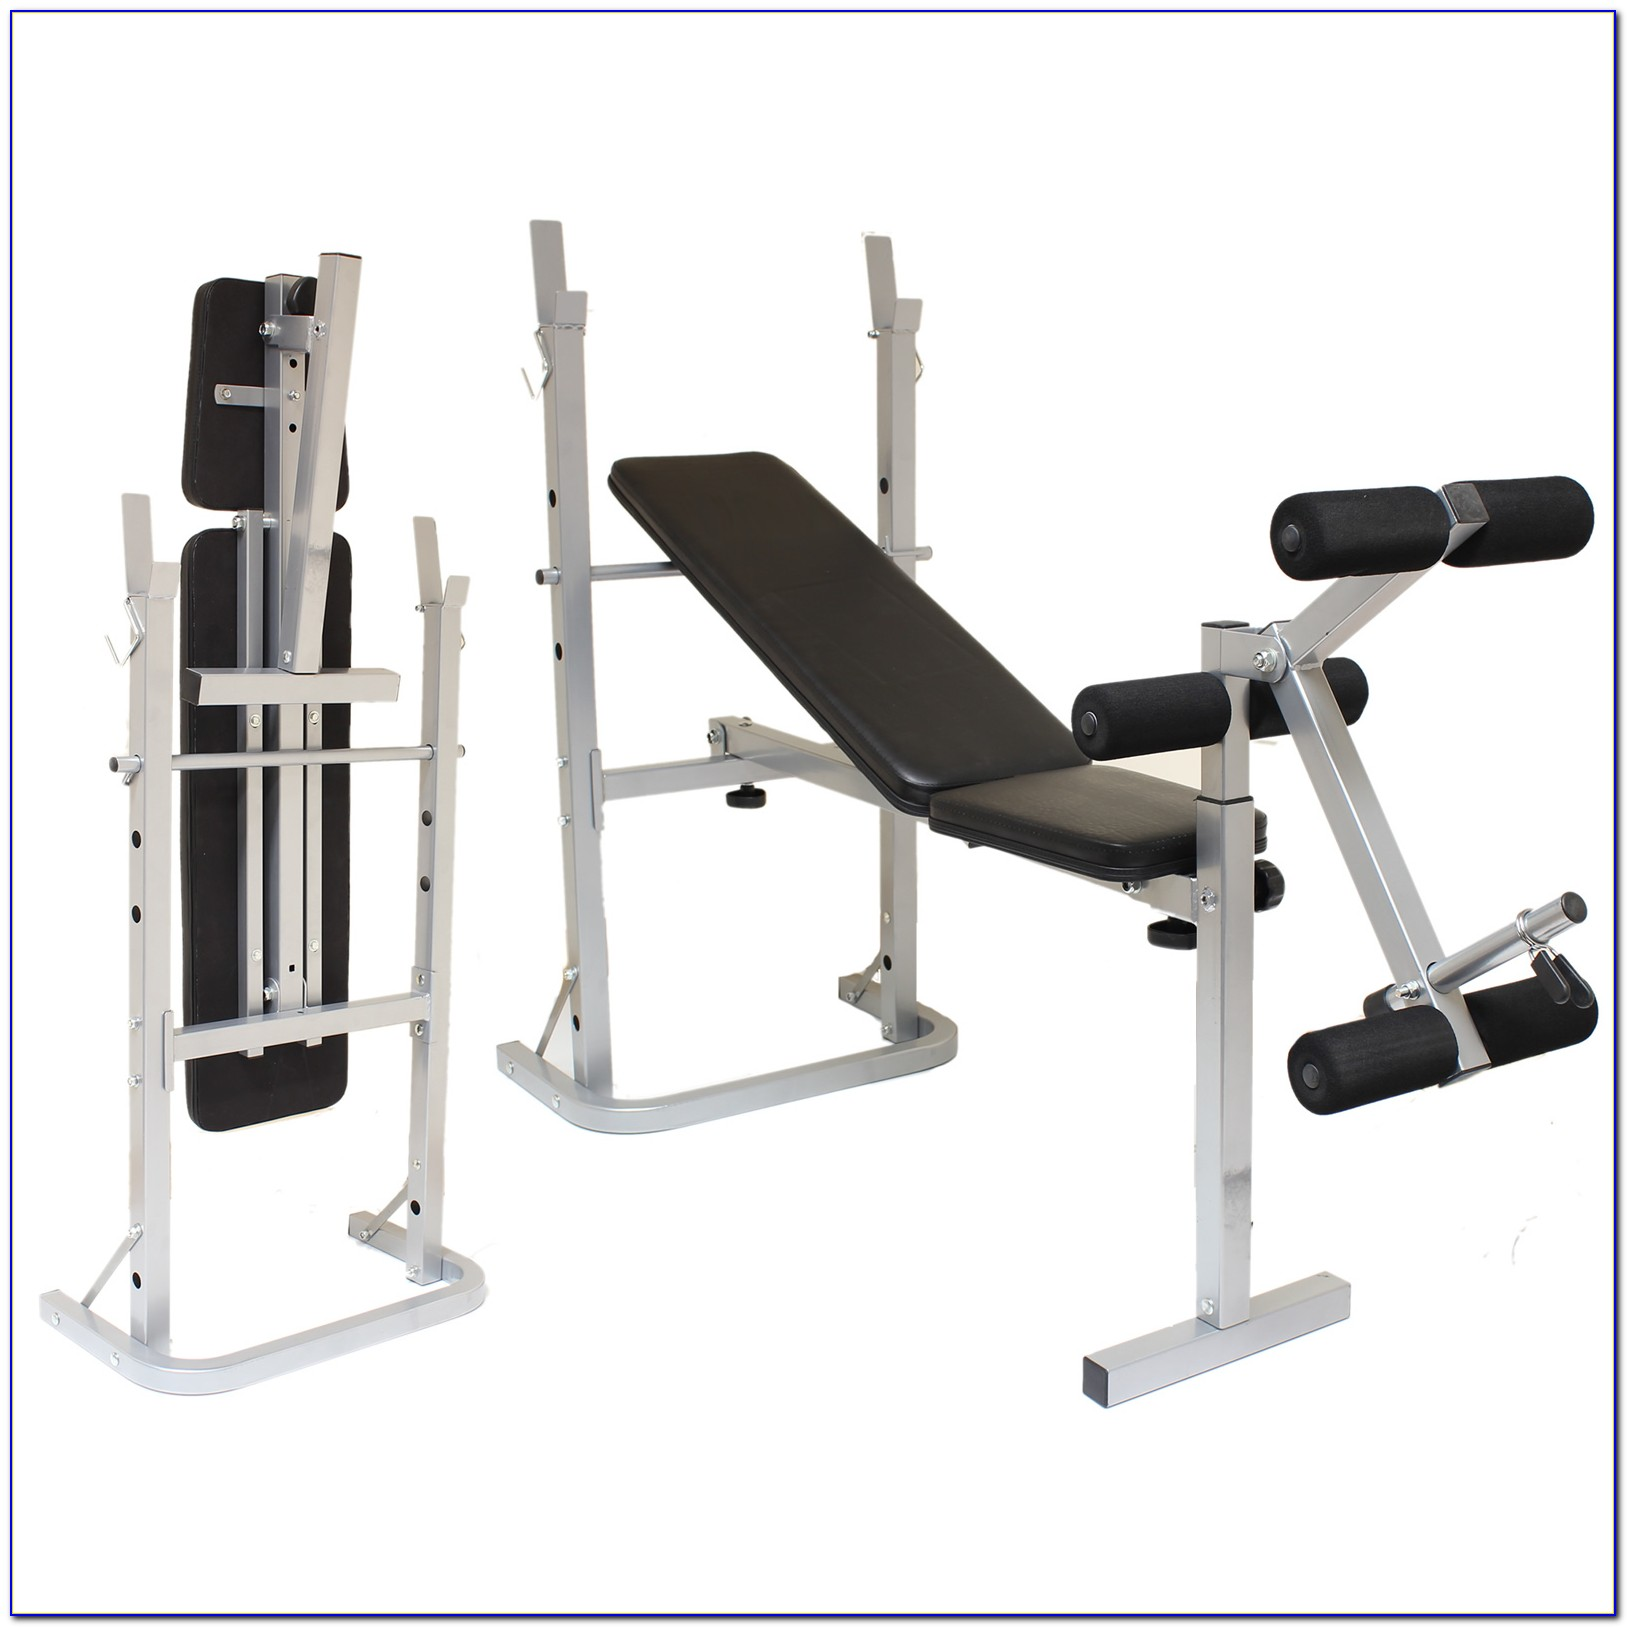 Fold Up Gym Bench